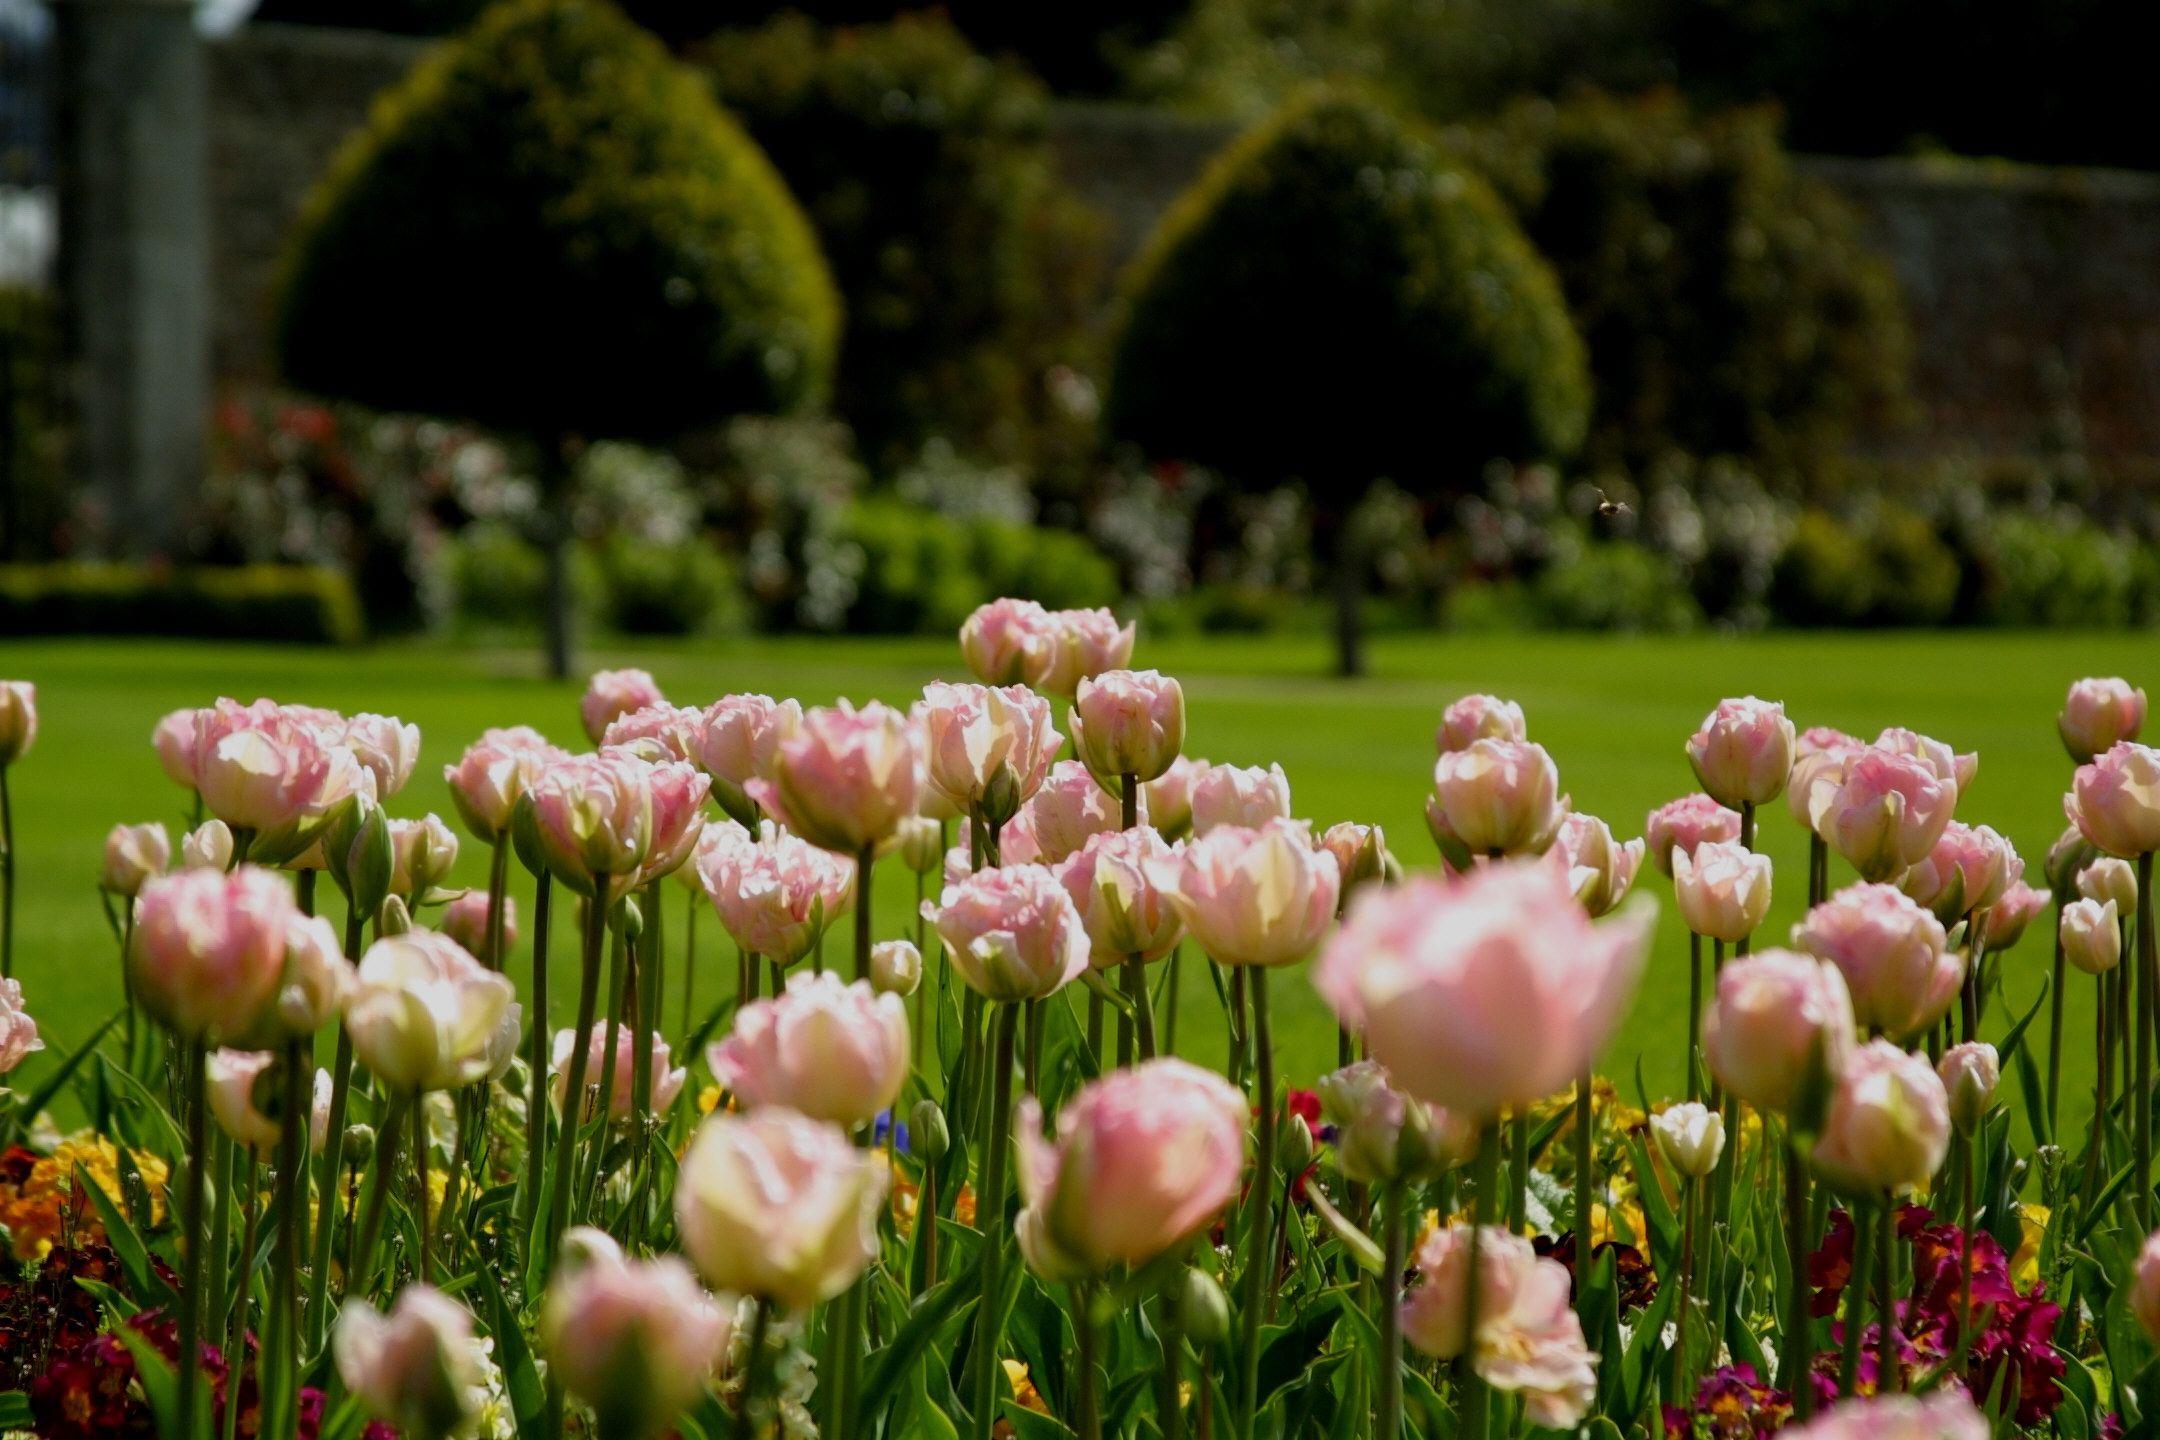 Beautiful Spring Tulips at Powerscourt Gardens, County Wicklow, Ireland